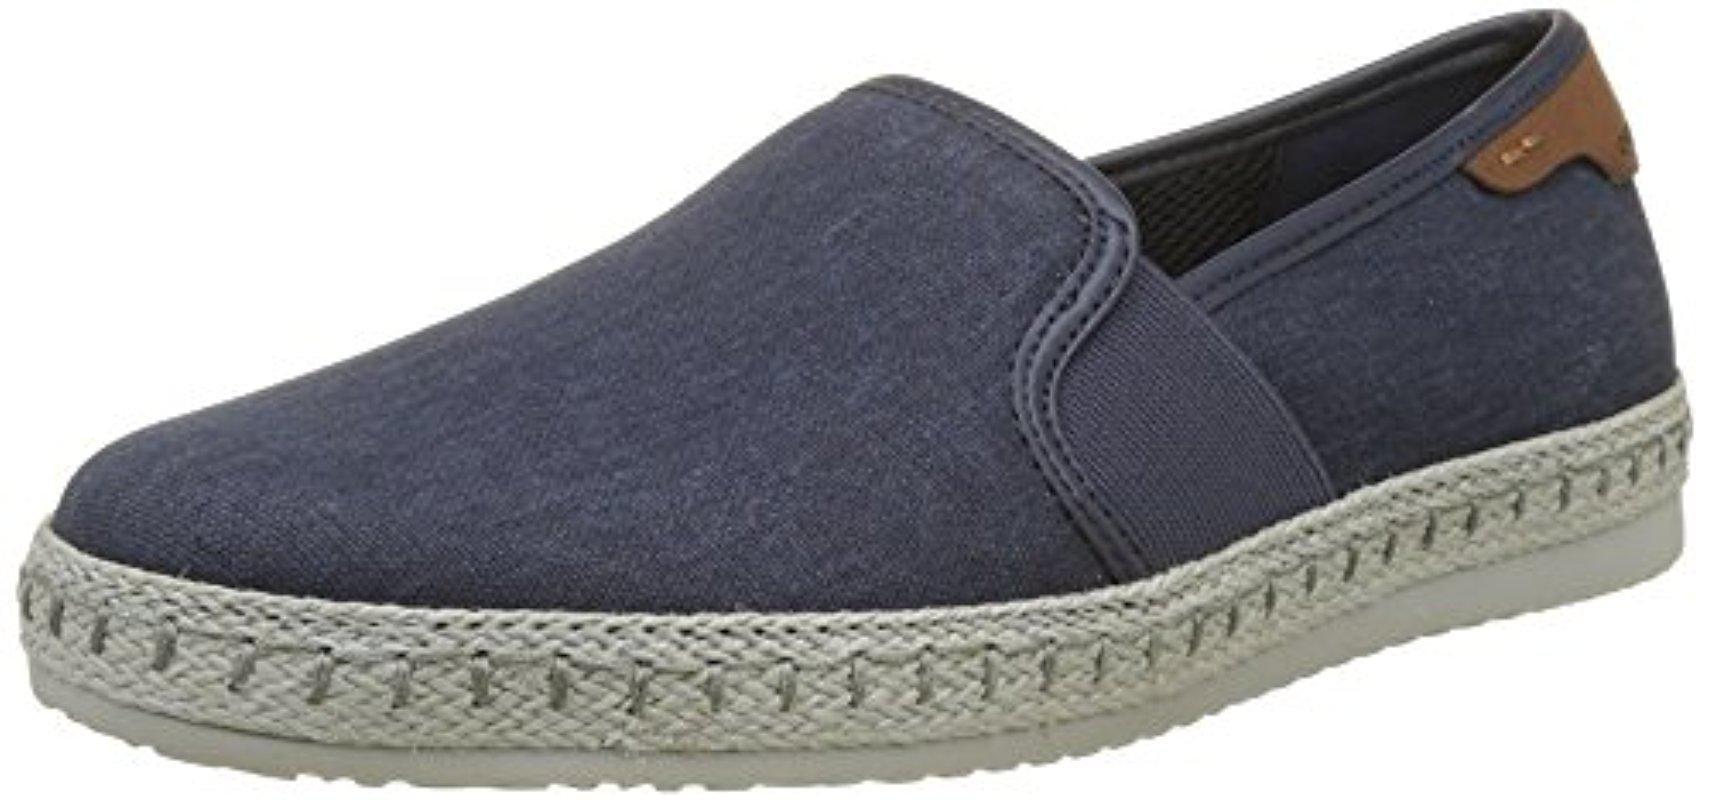 Geox Women's Modesty Woven Slip On Shoe: Amazon.ca: Shoes